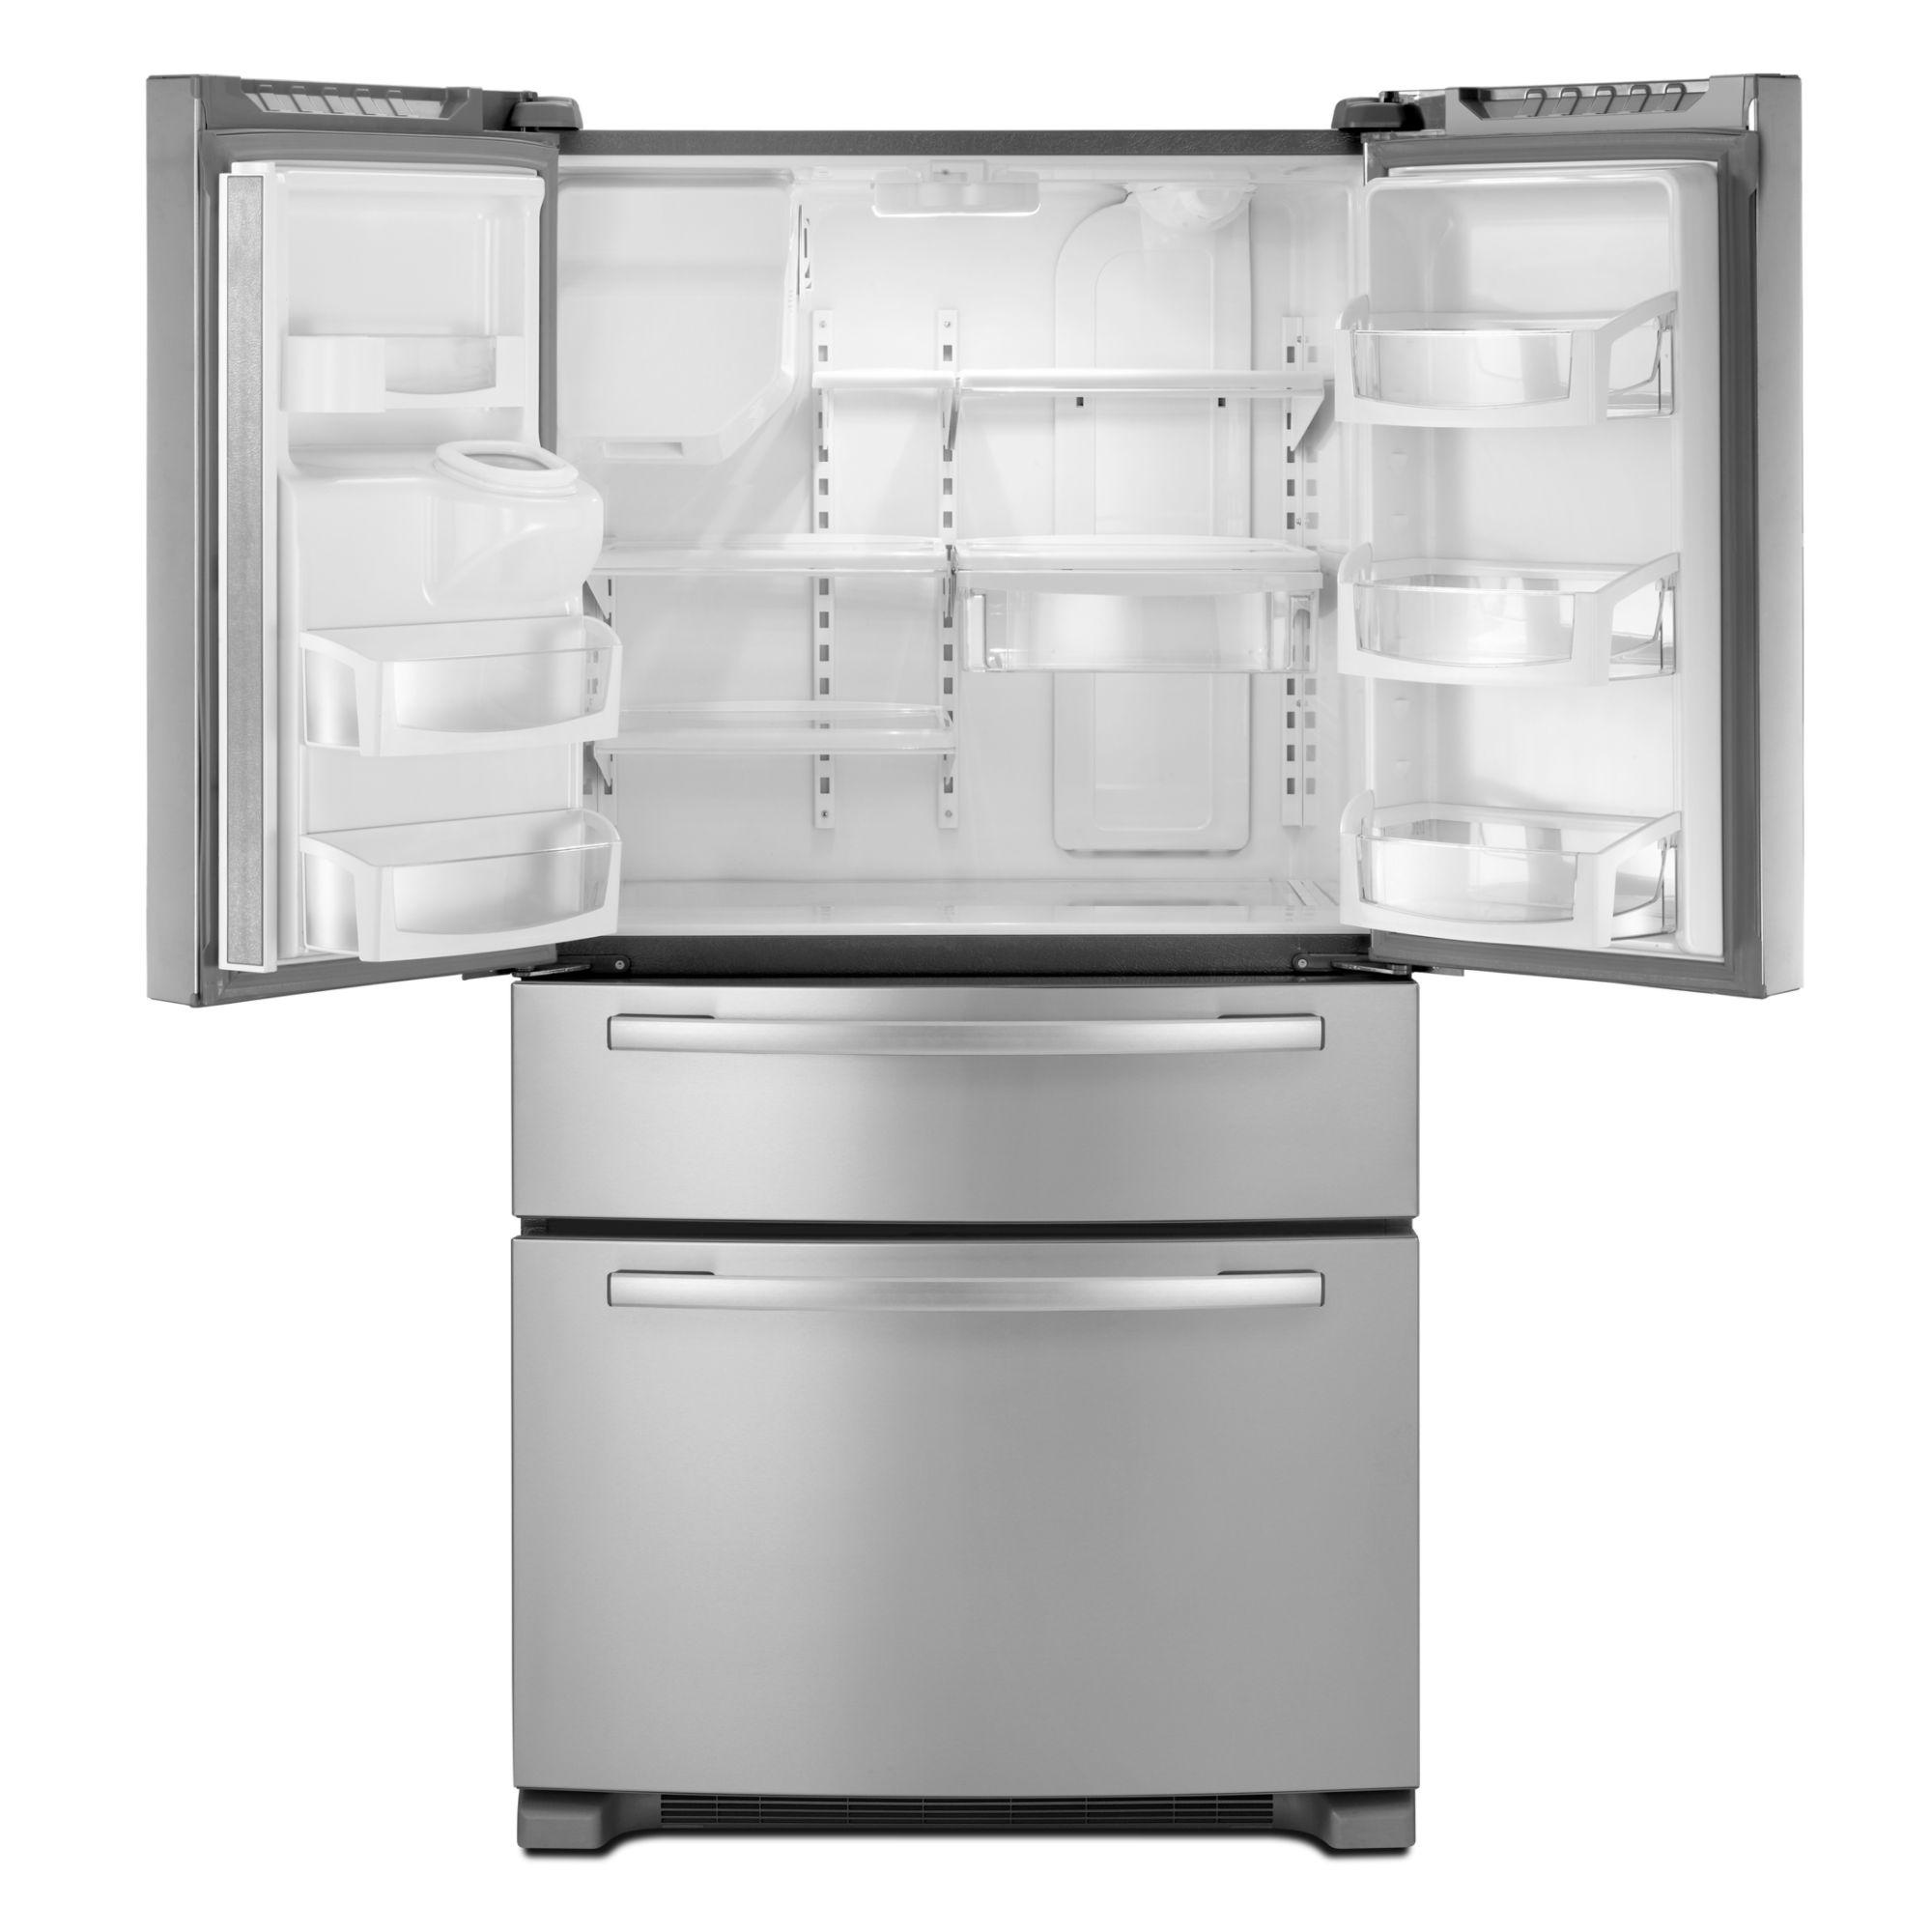 Whirlpool 25 cu. ft. French Door Refrigerator w/ External Pantry Door - Stainless Steel